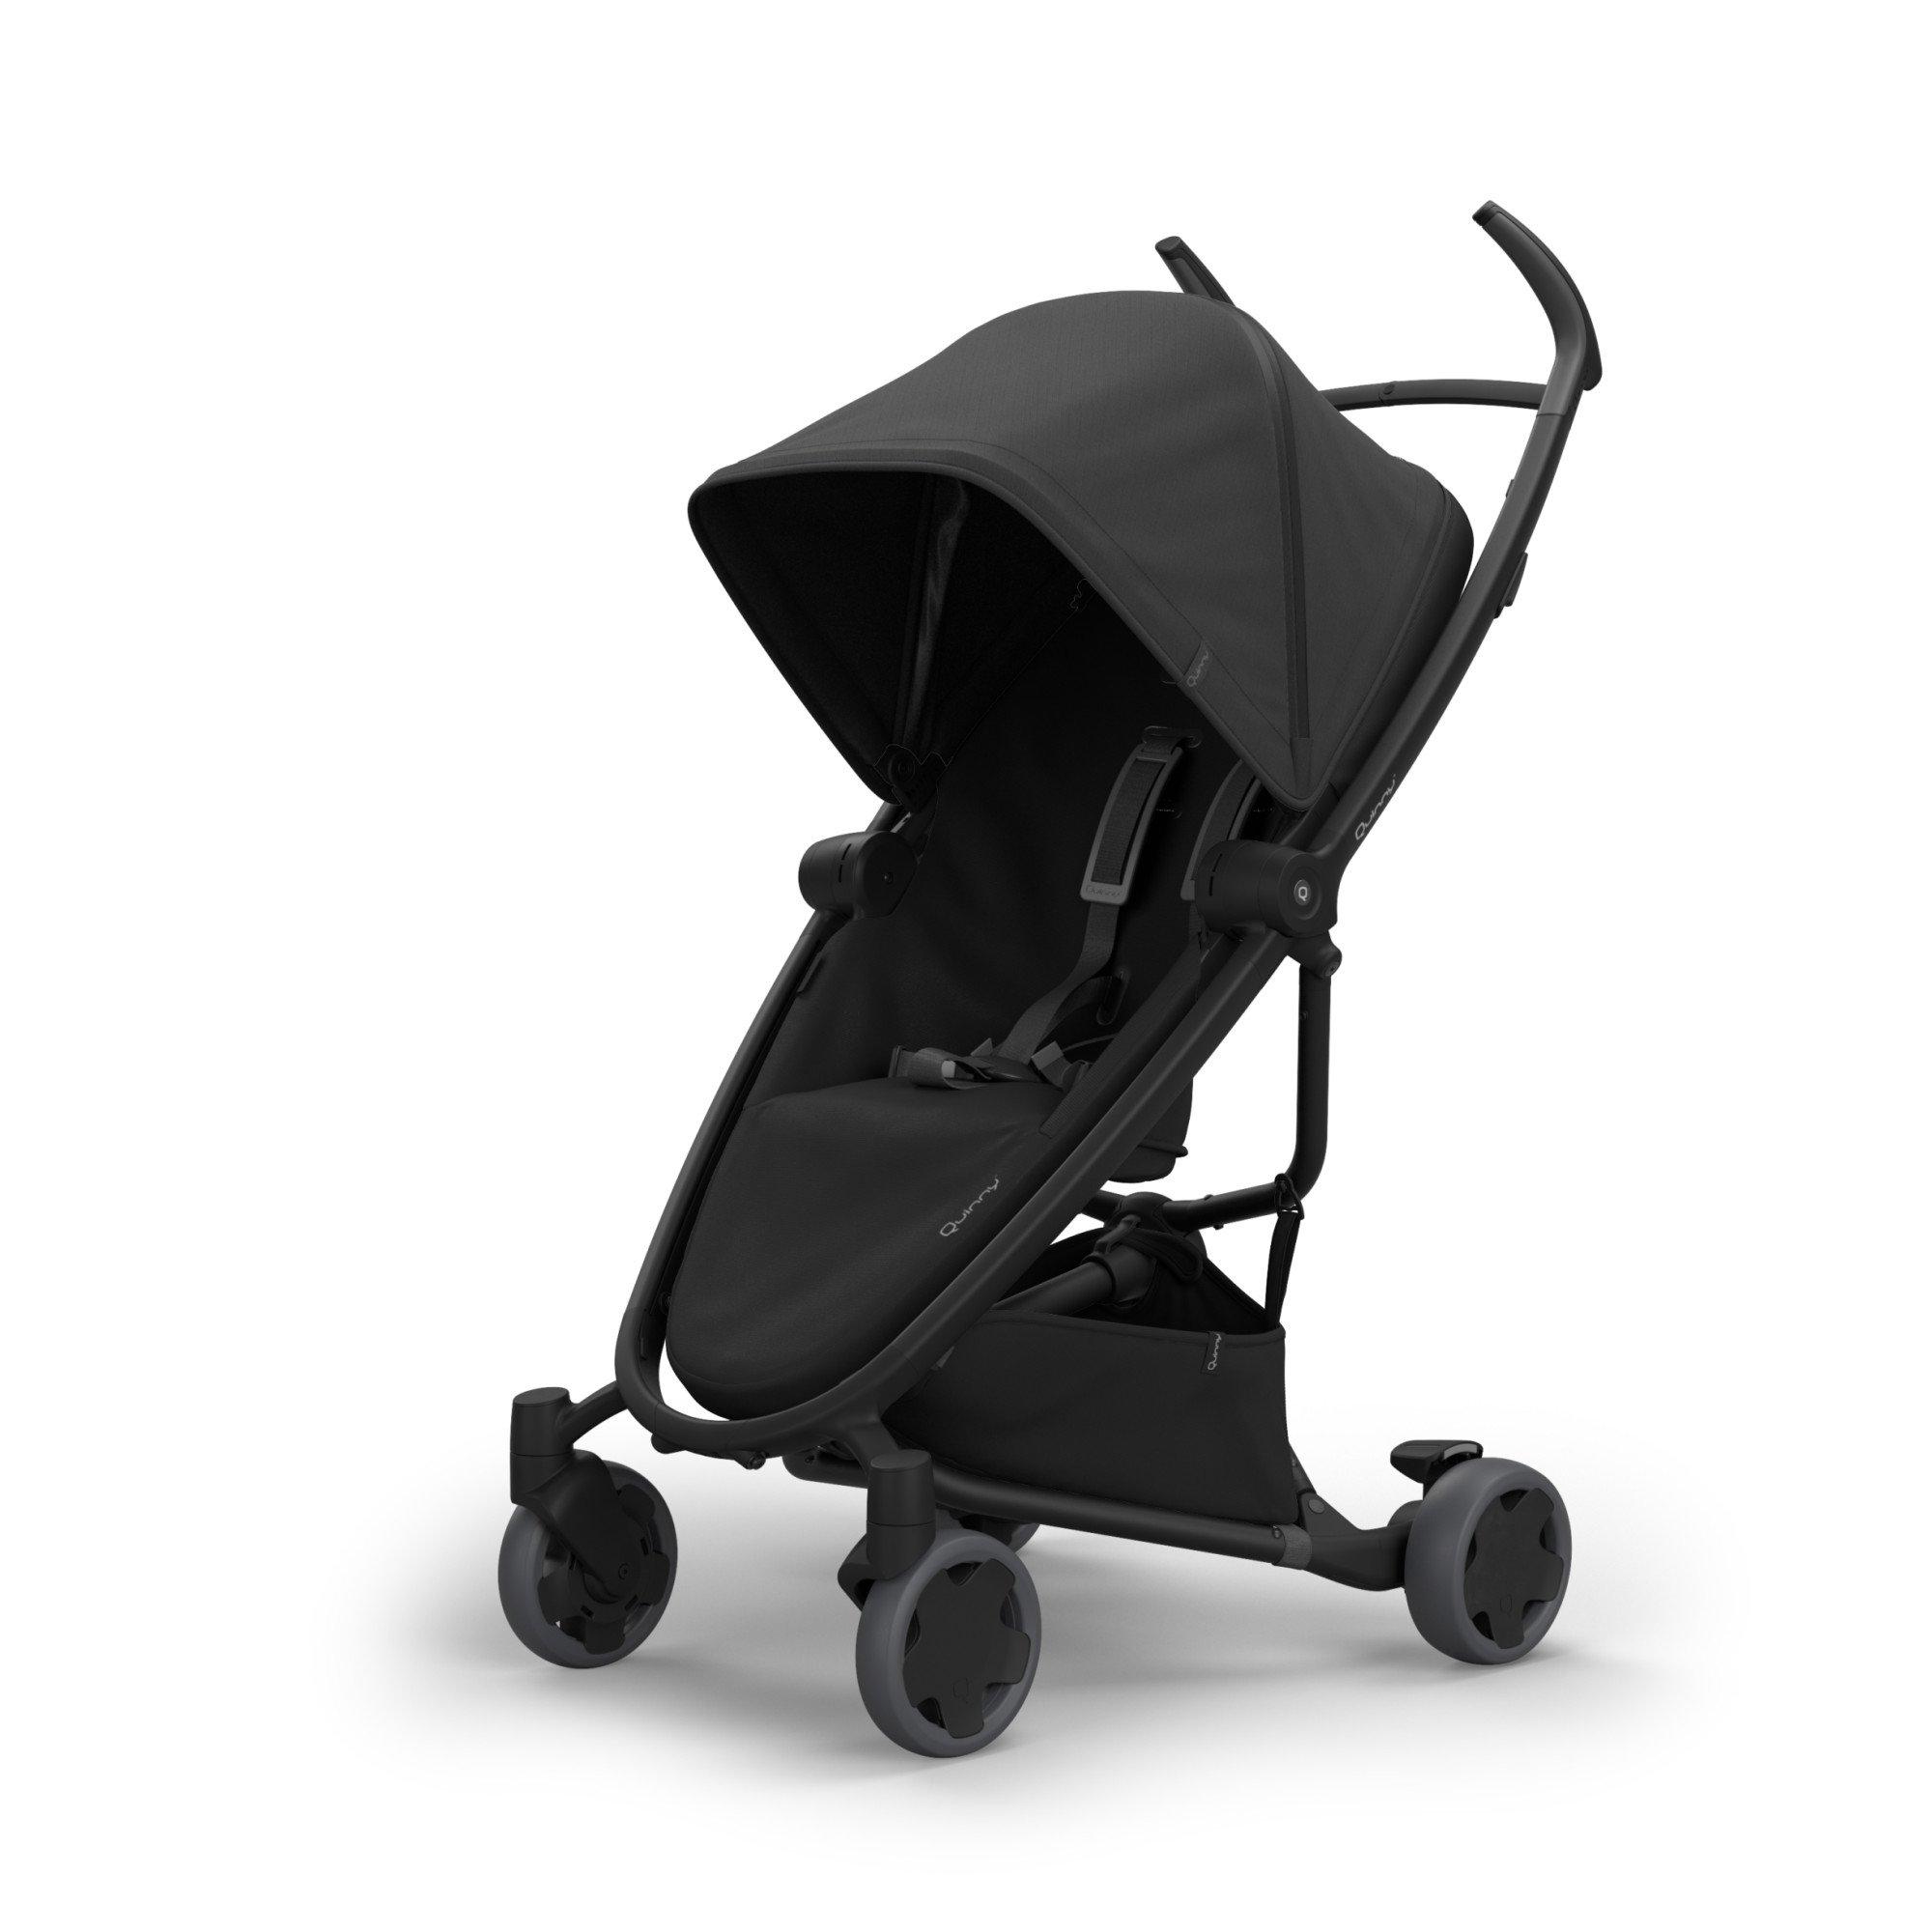 Quinny Zapp Flex Stroller, Black by Quinny (Image #1)